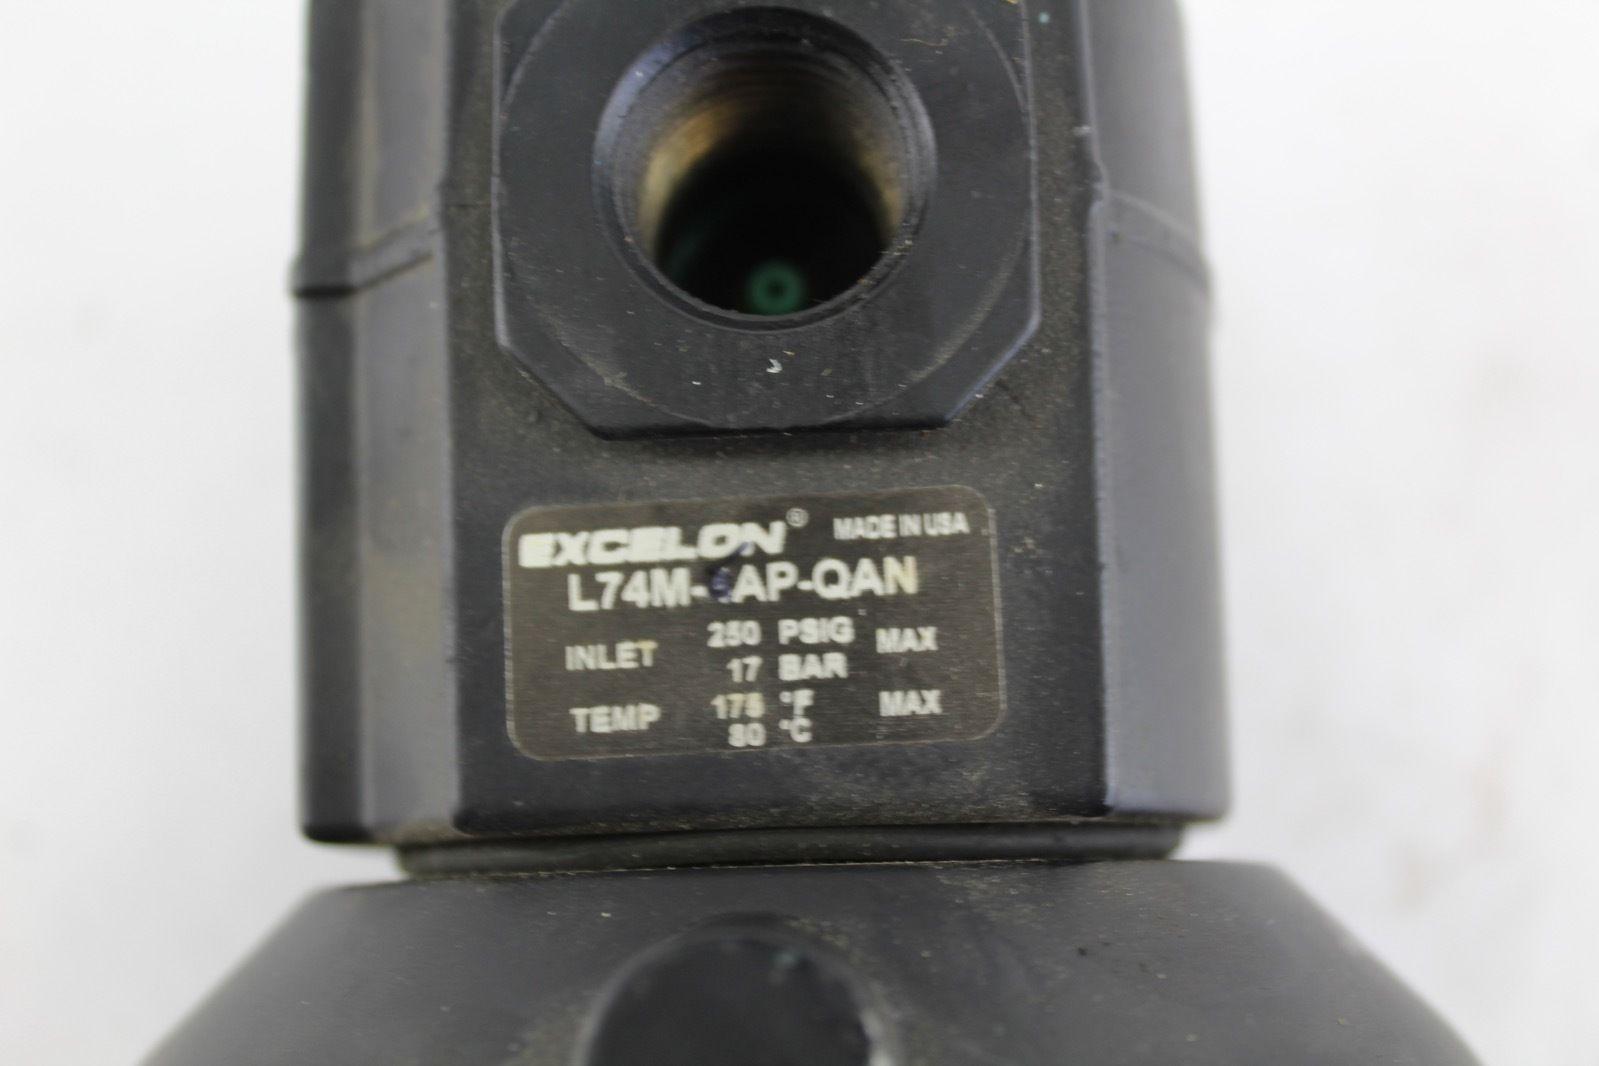 Excelon L74M-6AP-QAN Air Regulator *NEW* (B274) 2